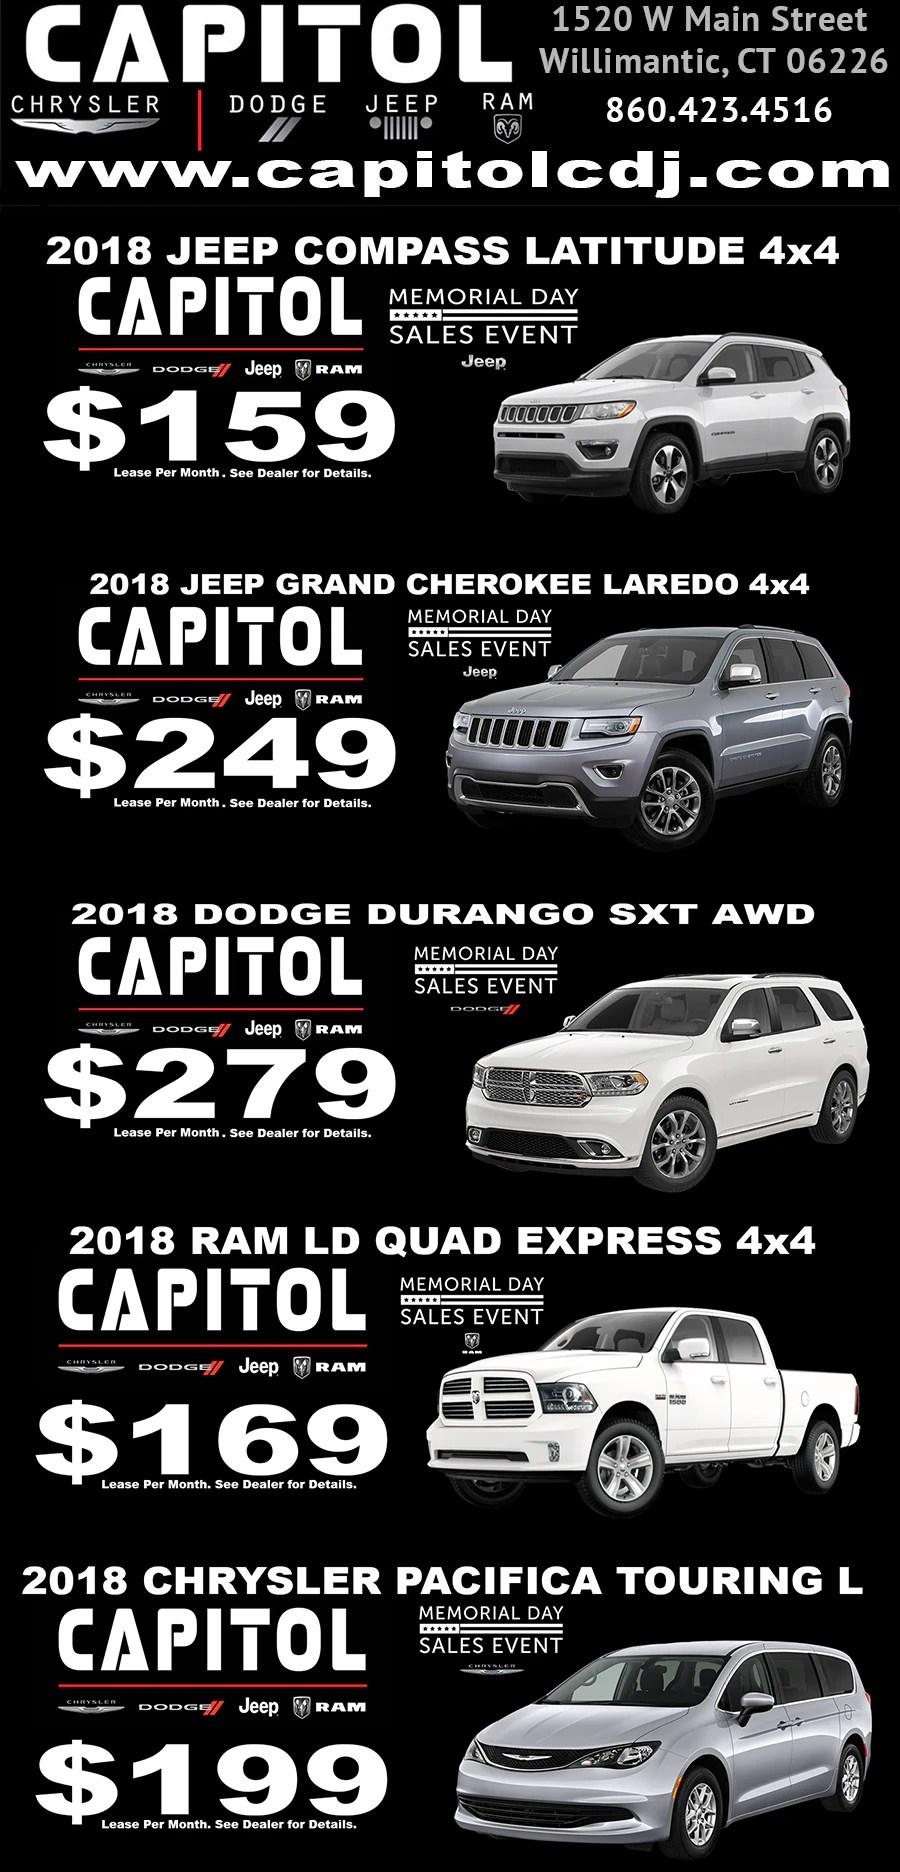 New Car Specials  Capitol Garage Chrysler Dodge Jeep RAM